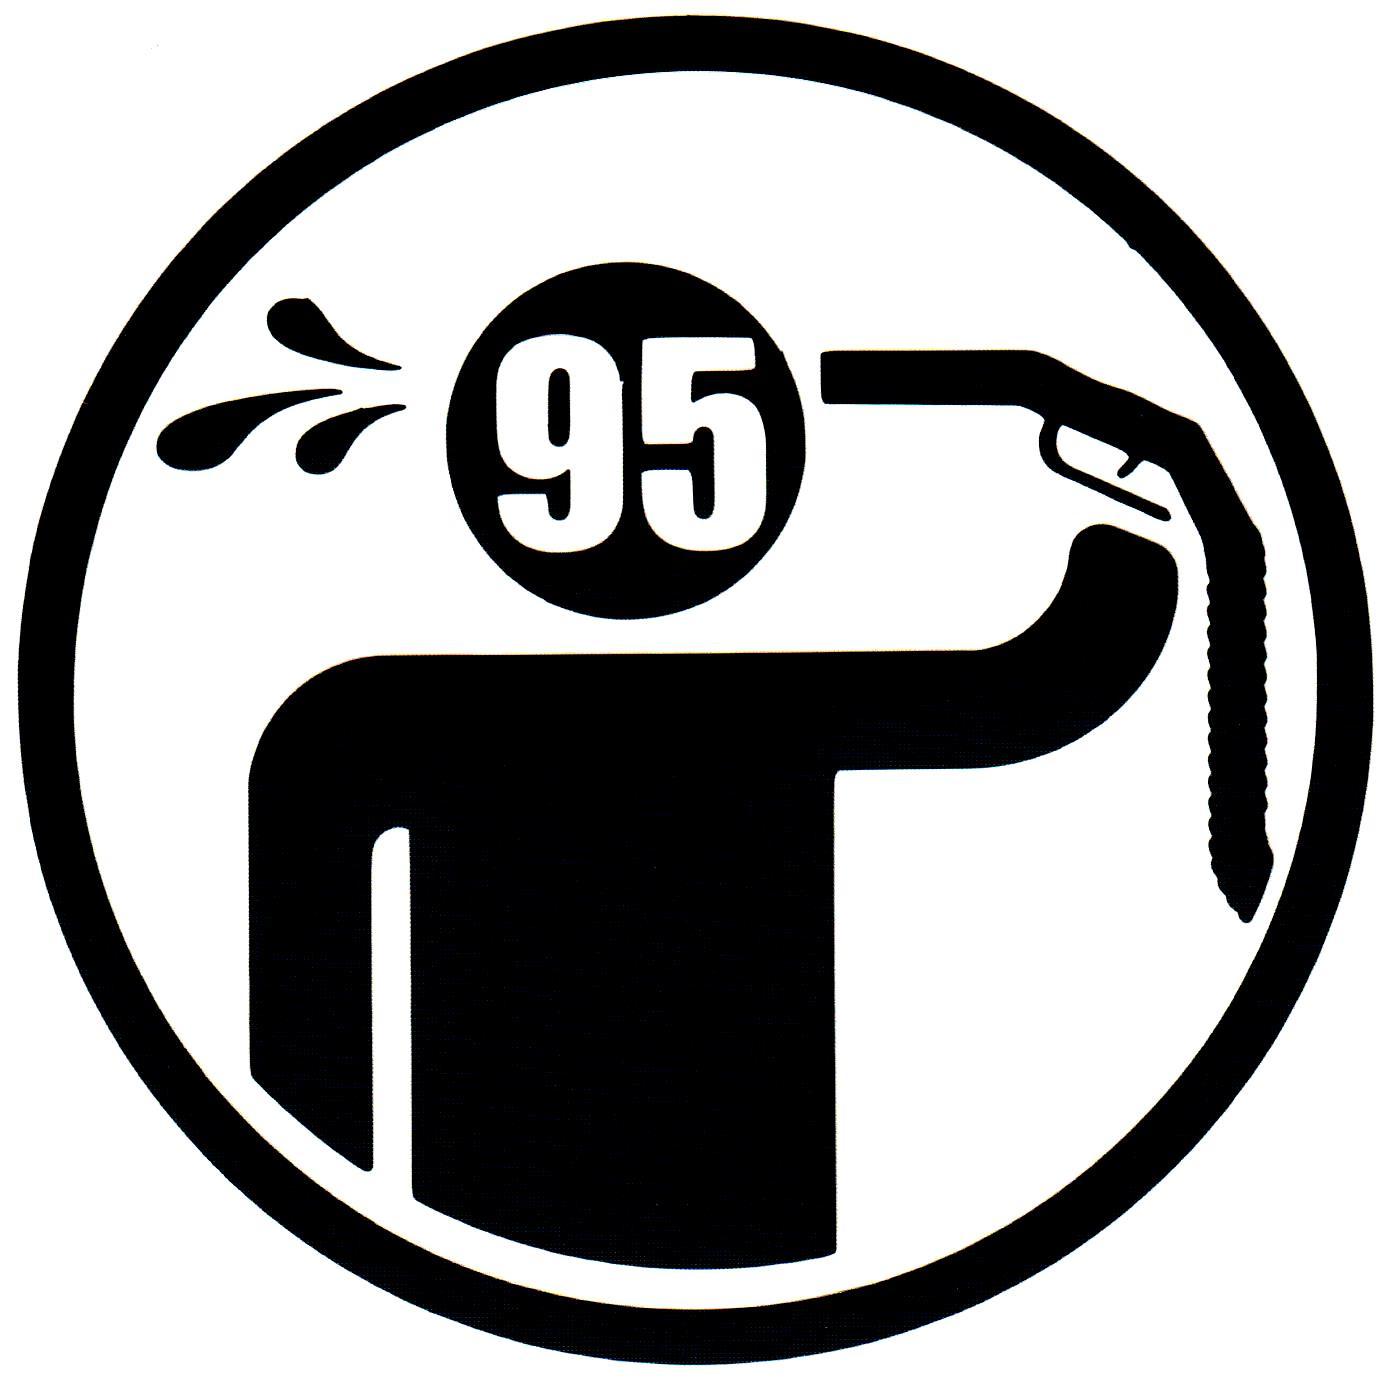 Наклейка автомобильная Mashinokom Цена АИ-95, VRC 015-12, 11,5*11,5 см наклейка автомобильная mashinokom внимание дети vrc 431 03 винил 10х12 см